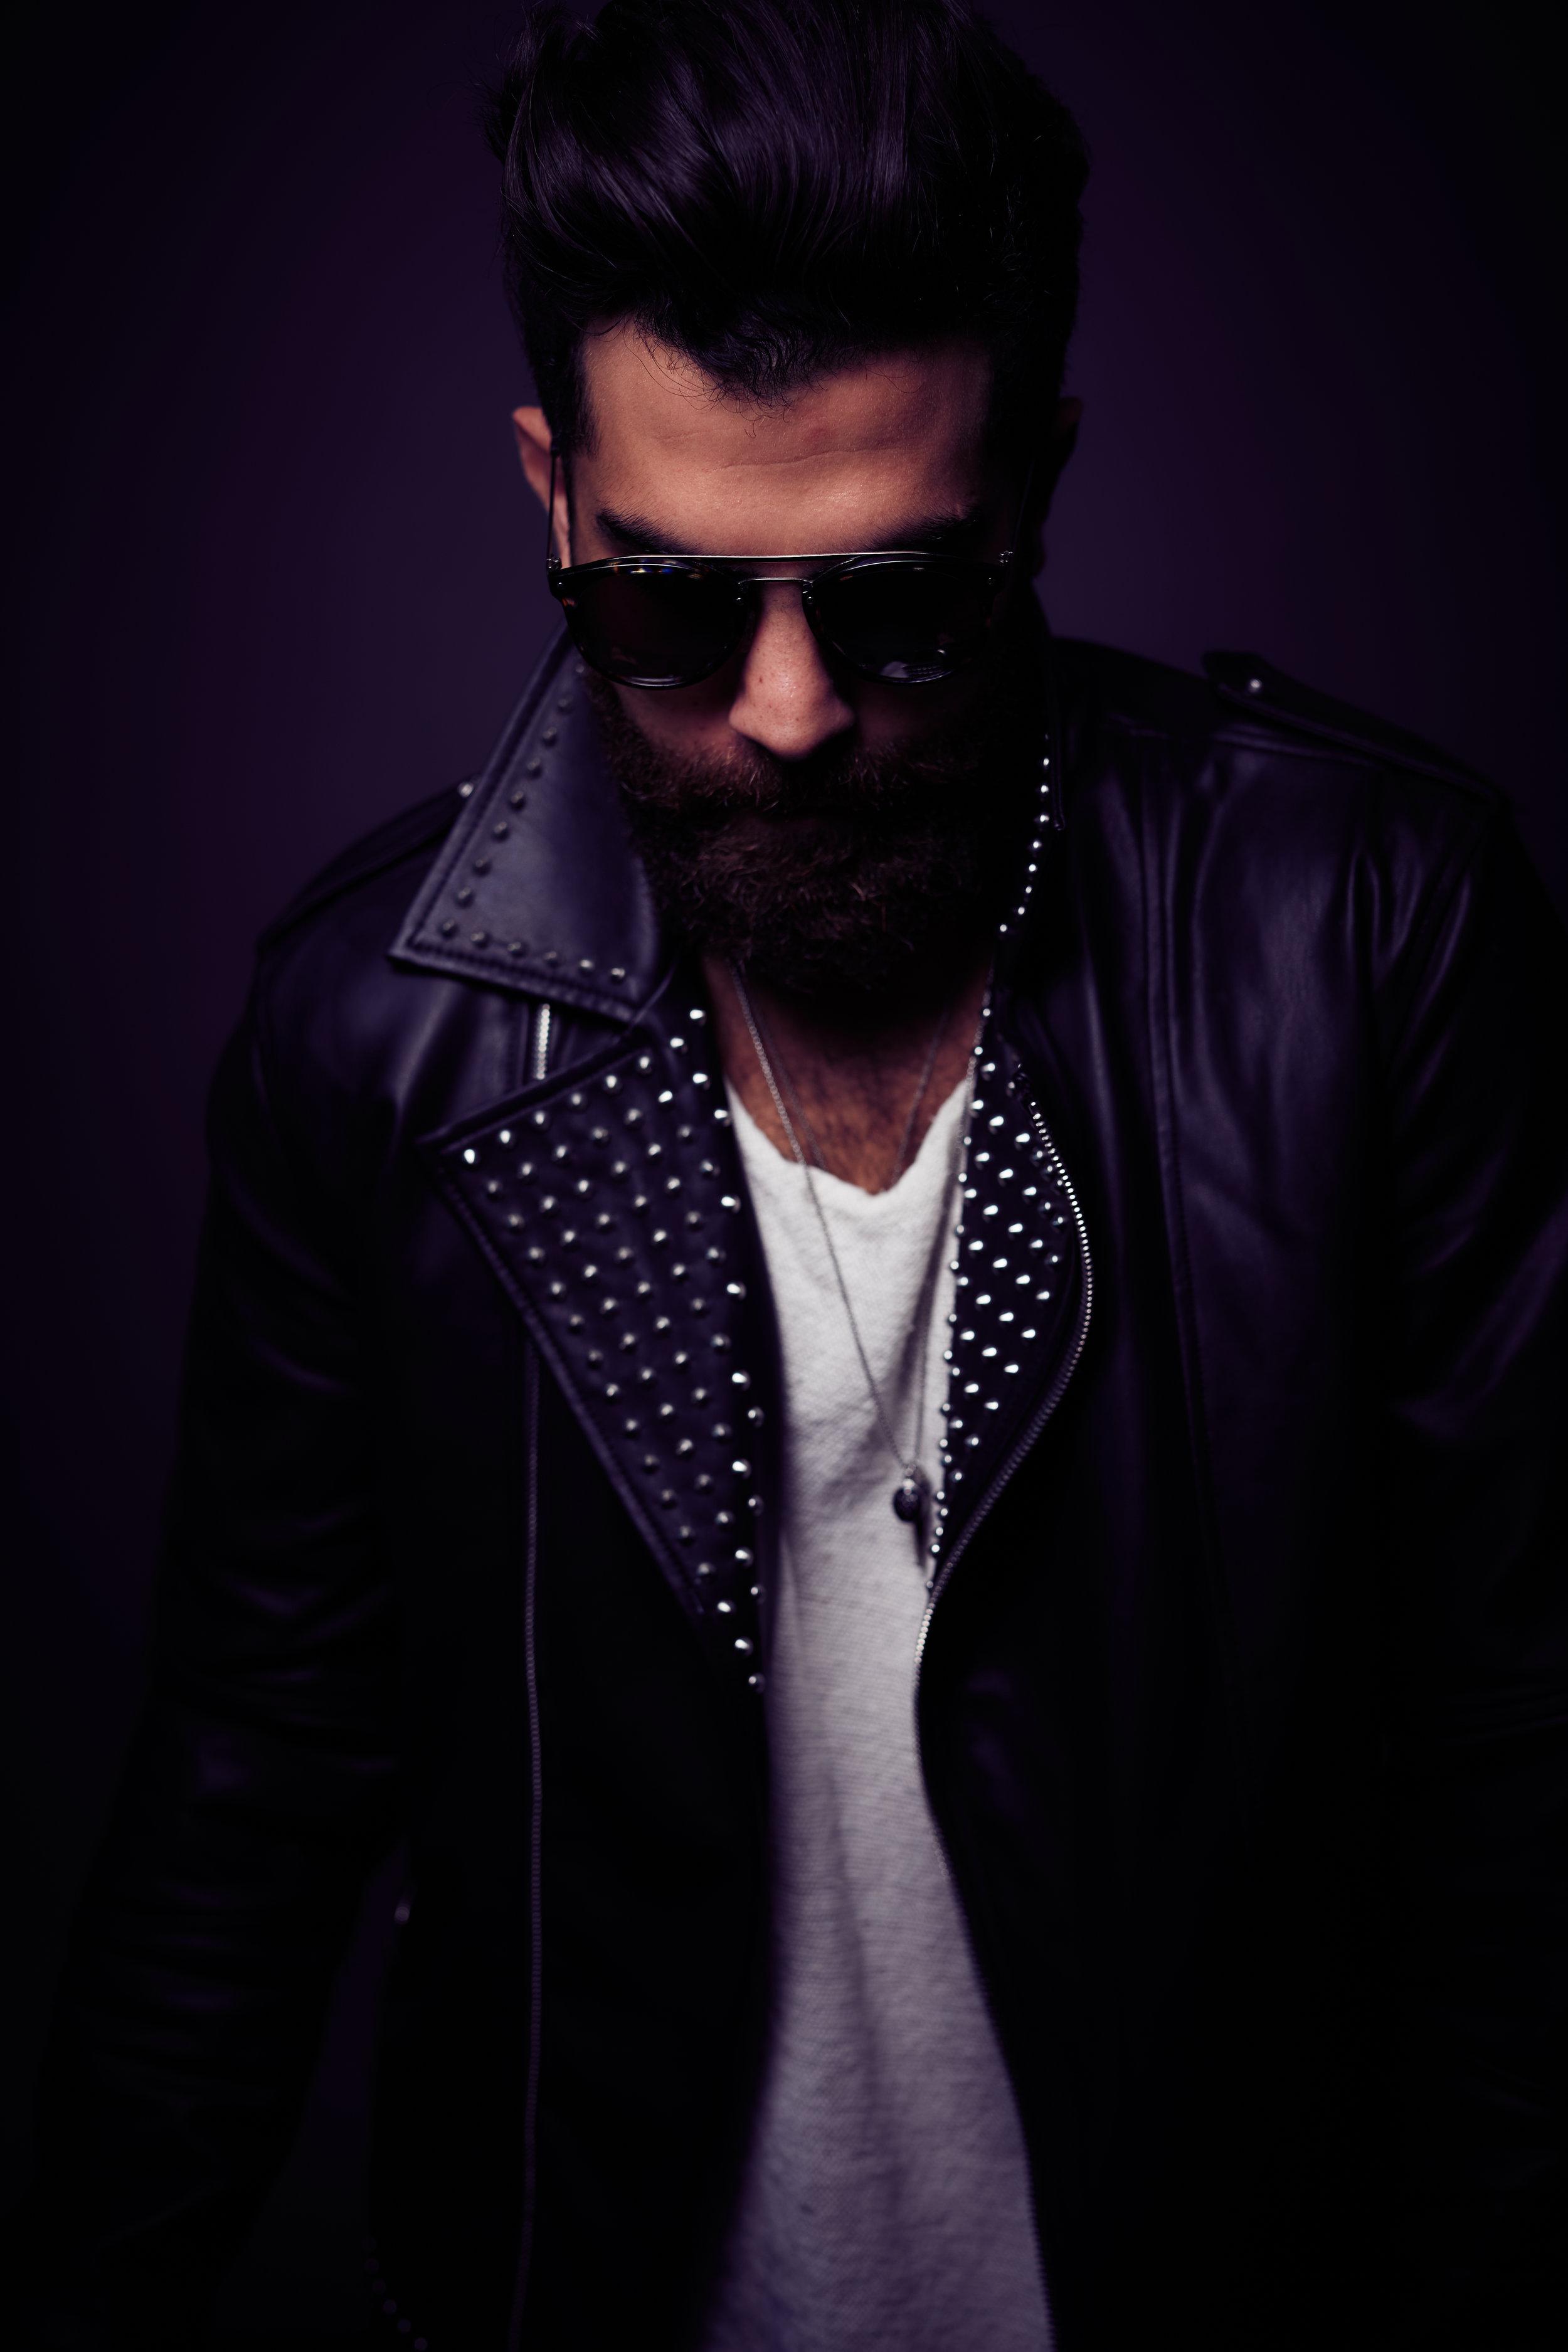 Portrait_063_Reza_Jackson_10375.jpg